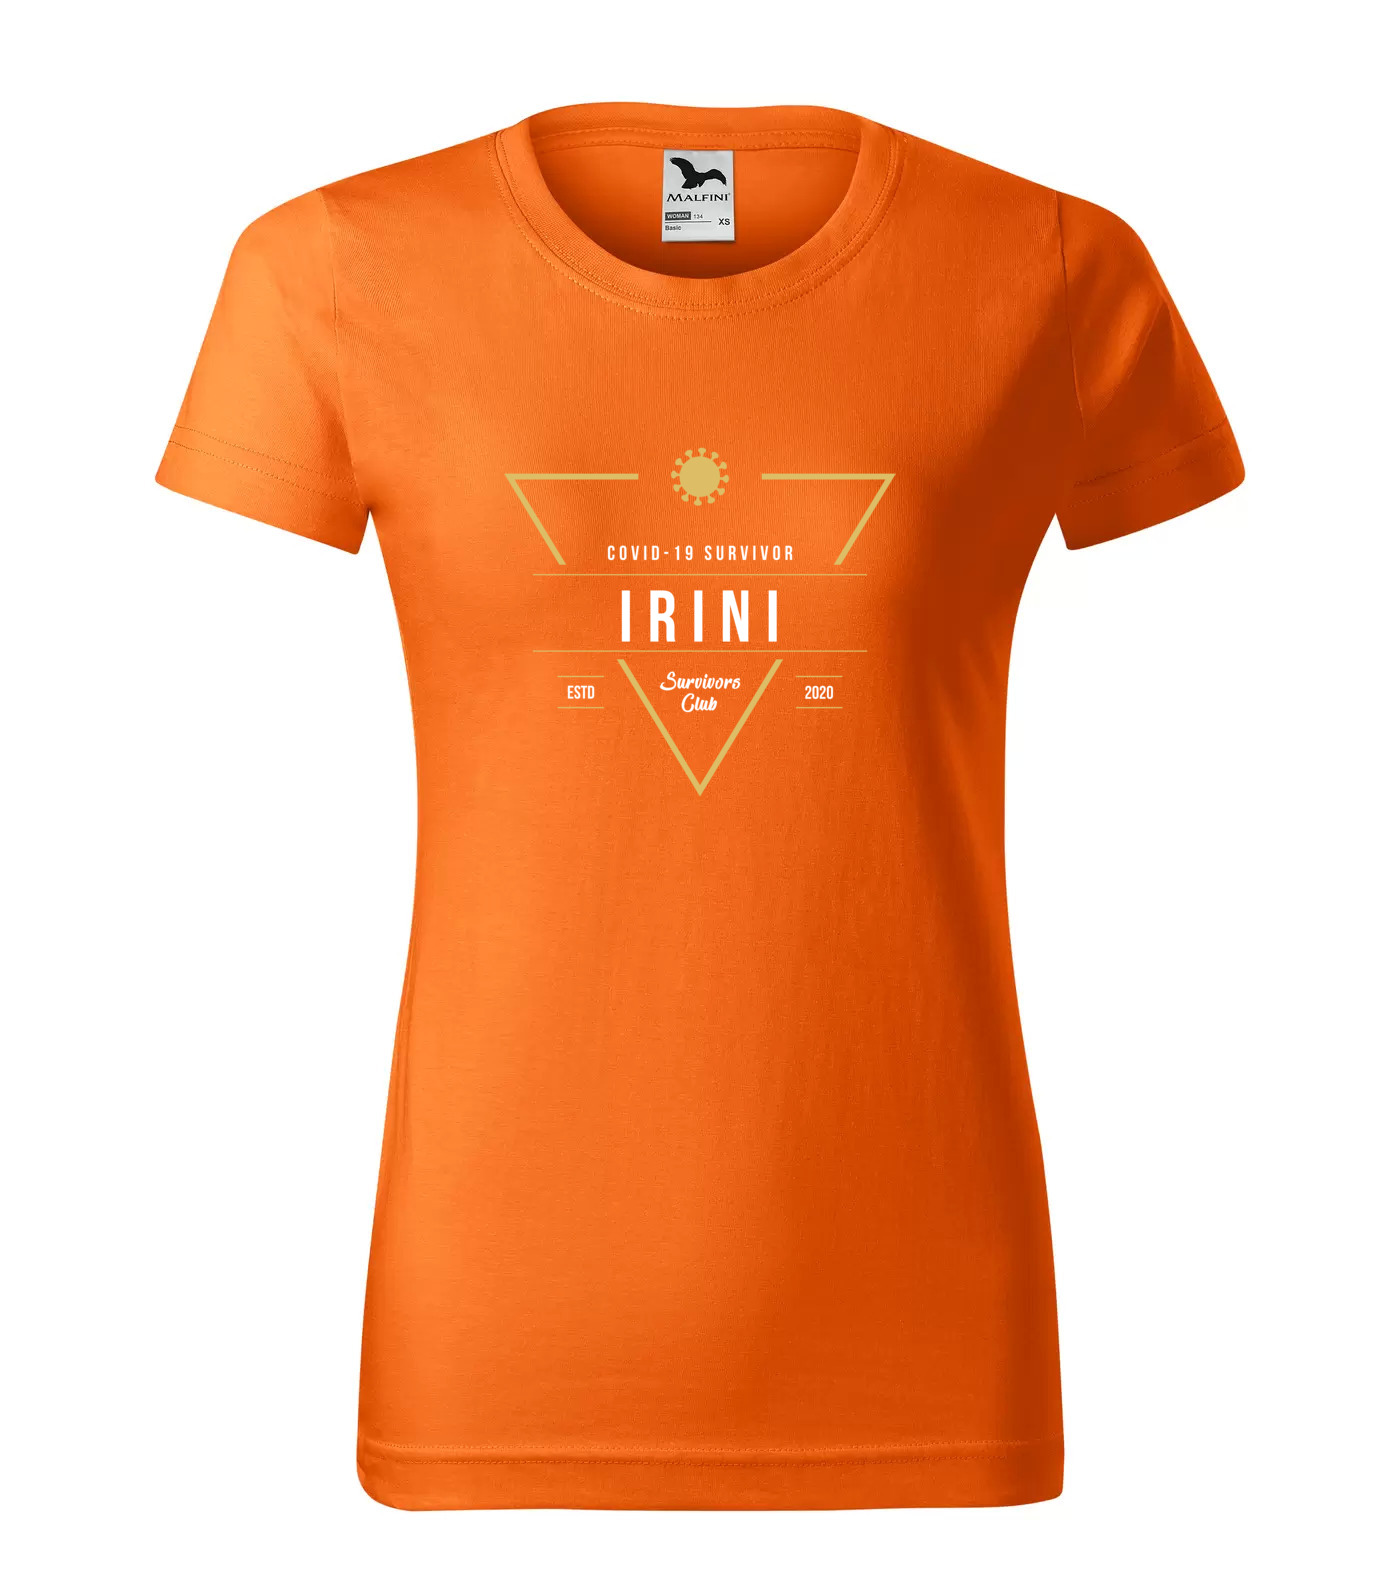 Tričko Survivor Club Irini